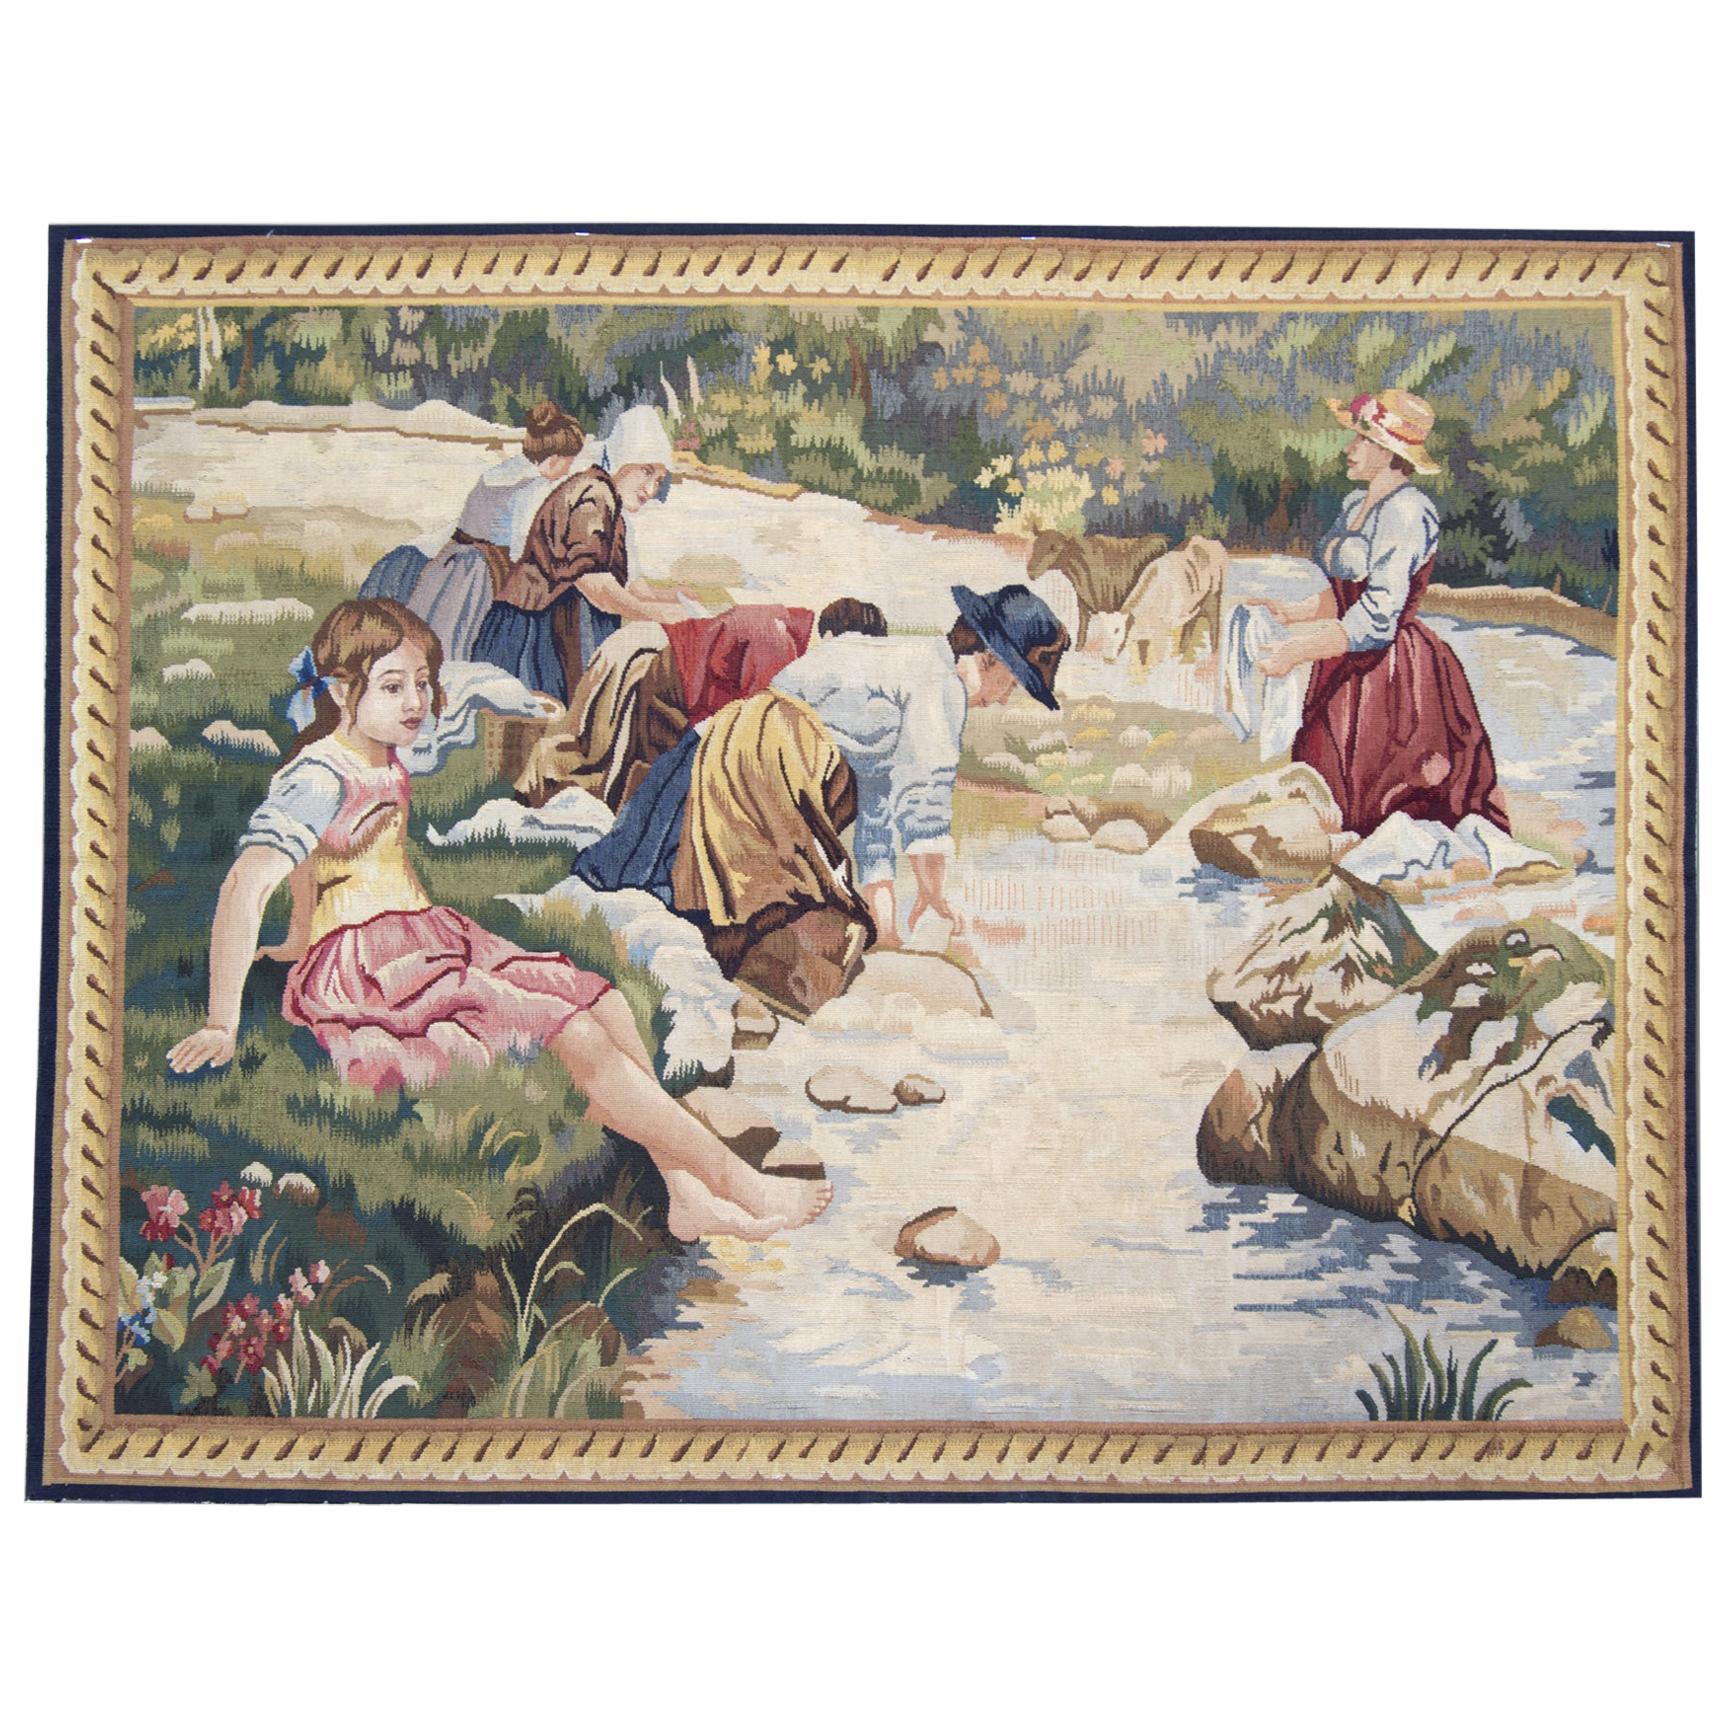 Handmade Rugs Needlepoint Carpet Tapestry Wall Hanging Rug